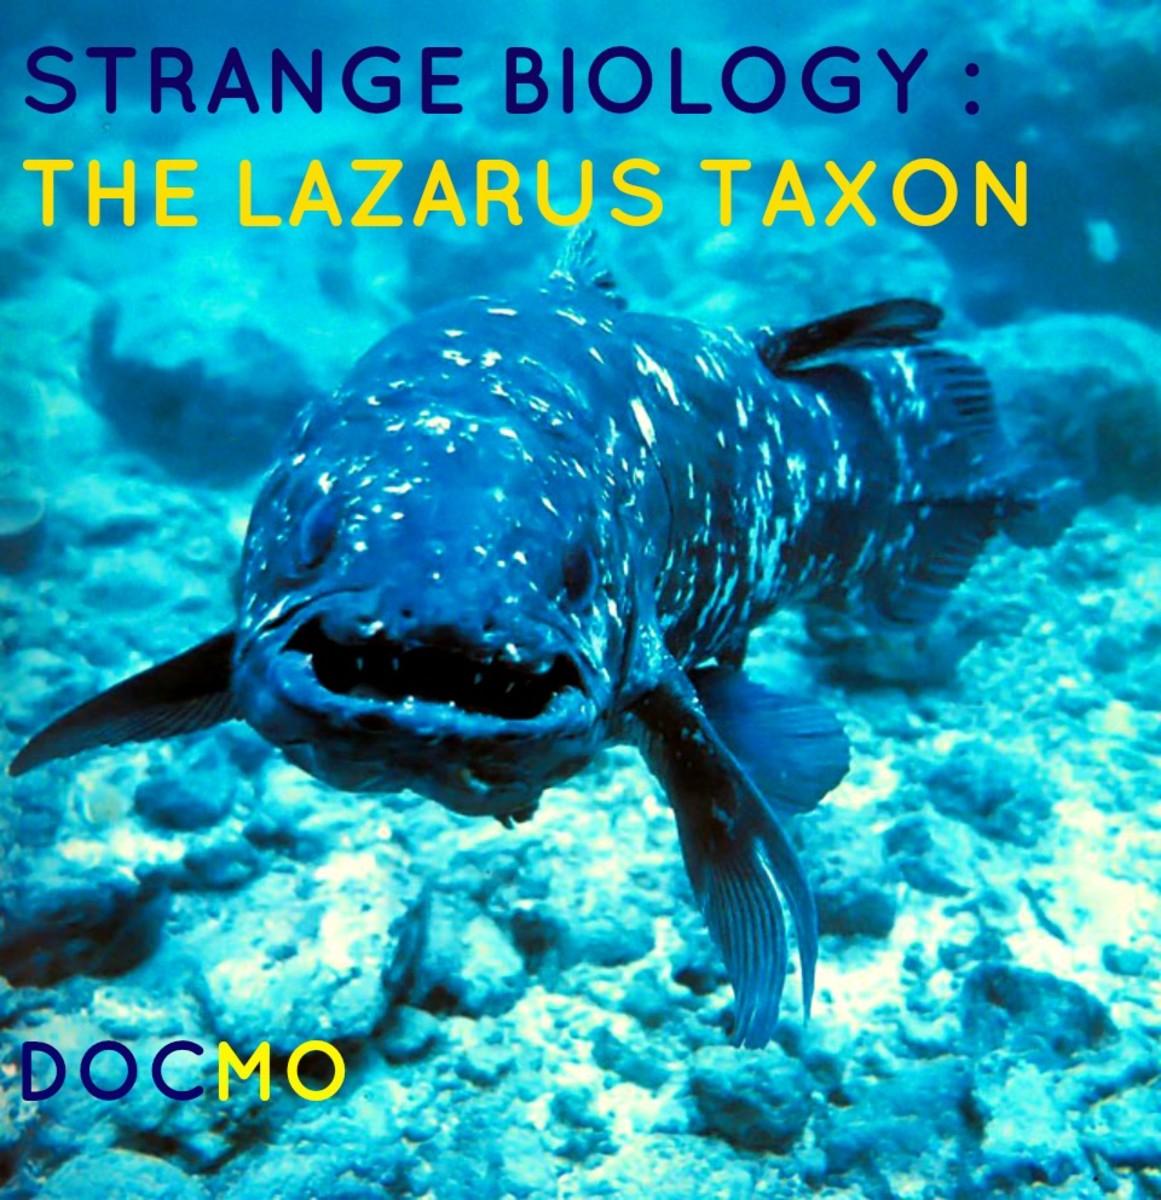 The Lazarus Taxon